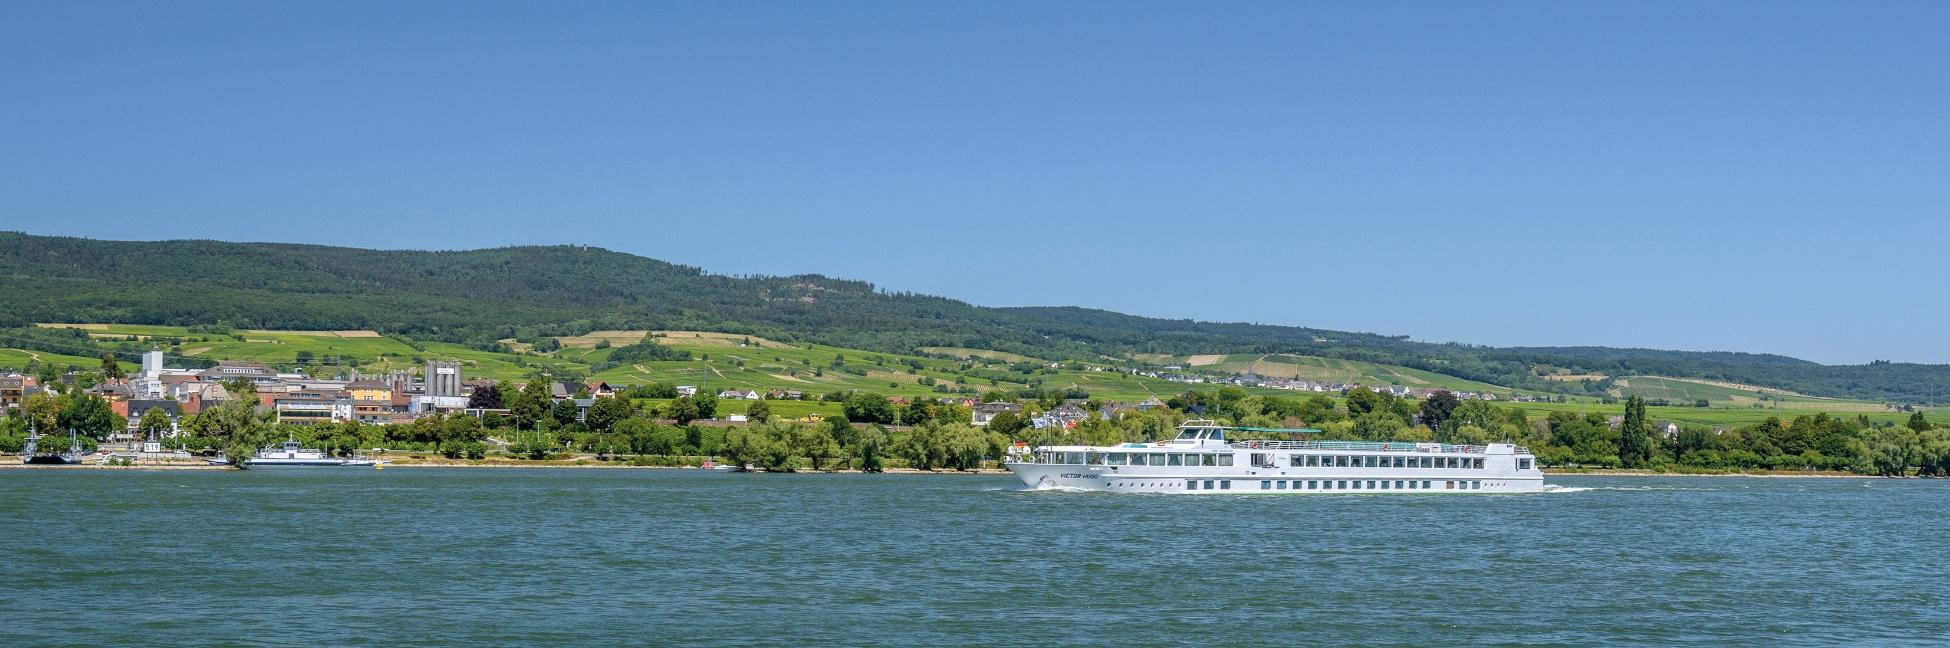 MS Victor Hugo sur le Rhin et le Danube